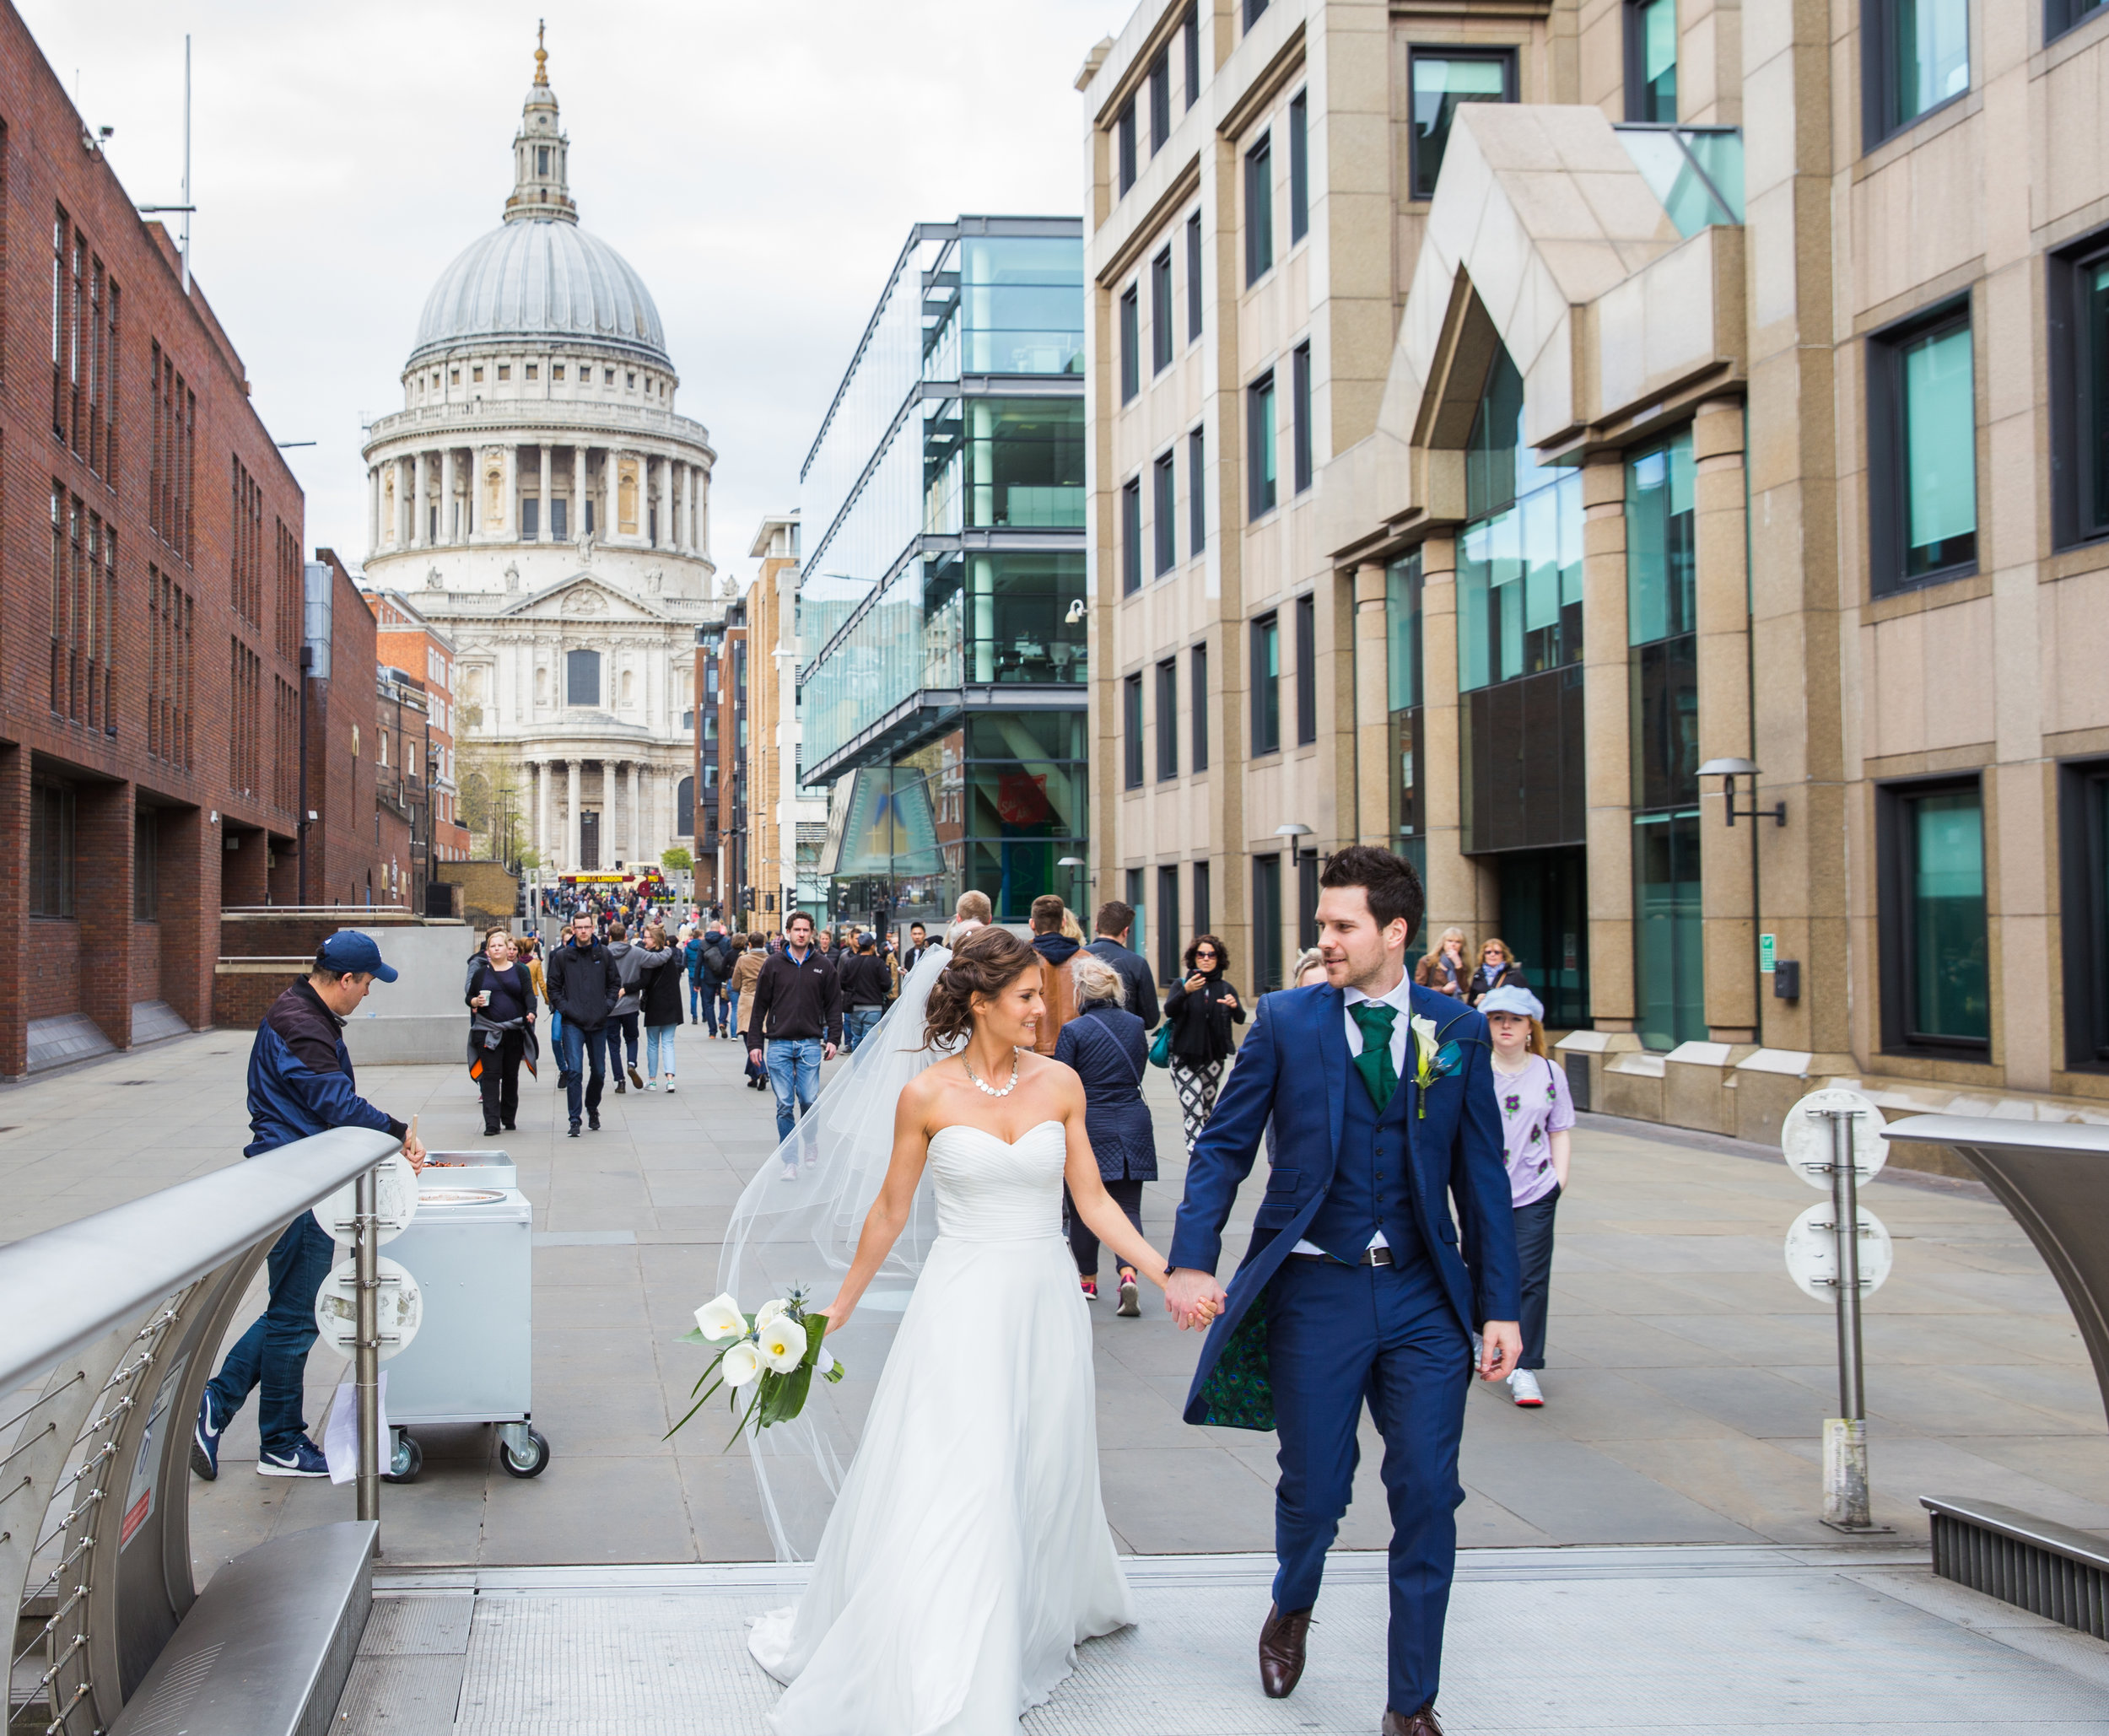 London Wedding Baltimore Photographers-7.jpg